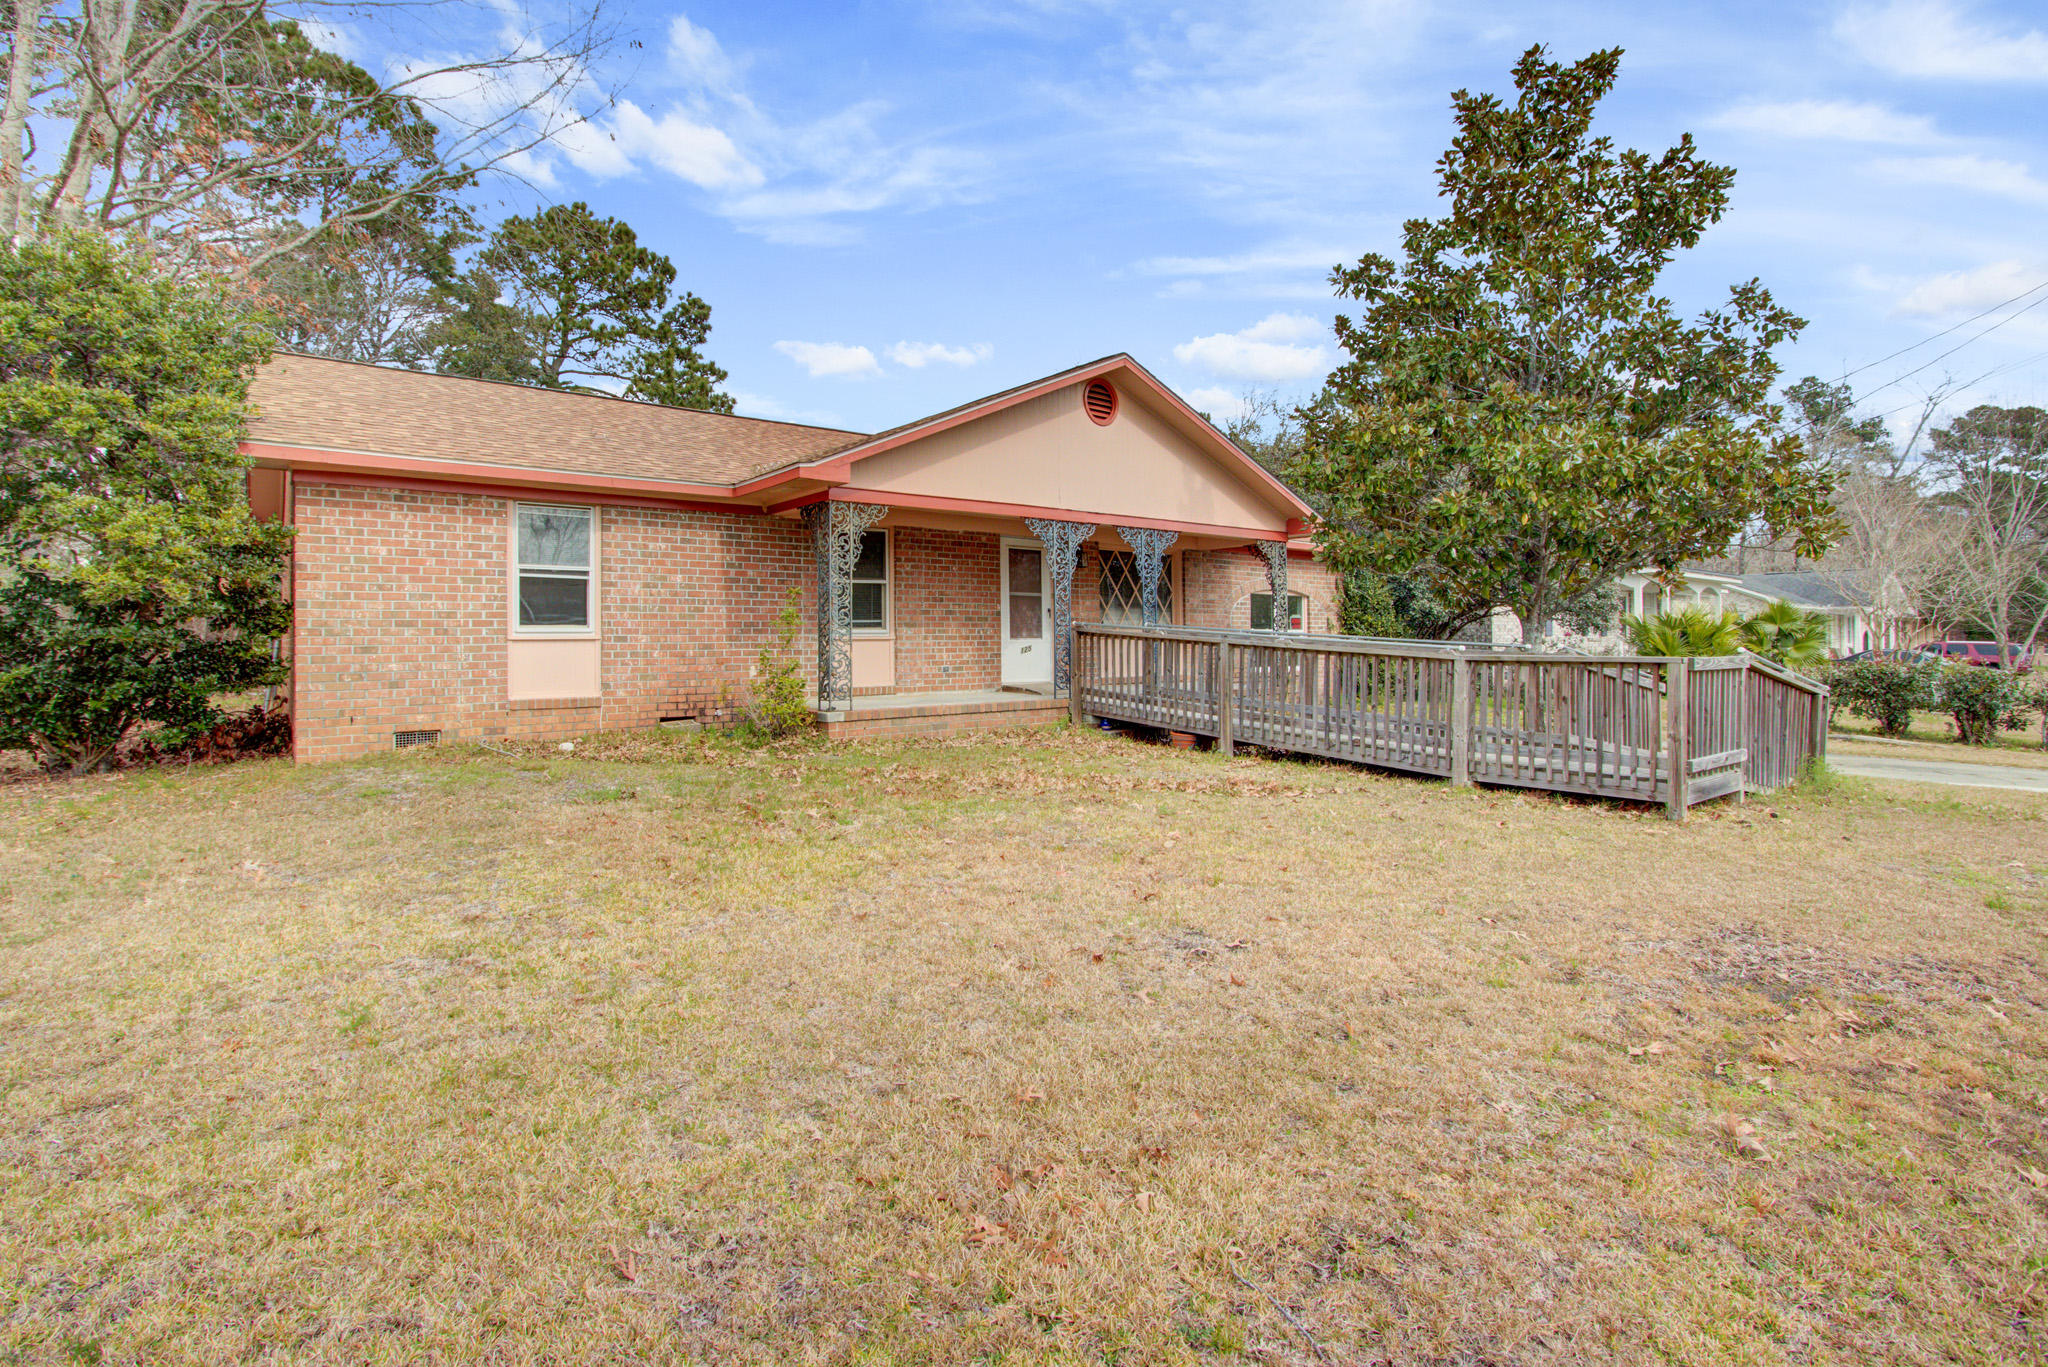 Bushy Park Terrace Homes For Sale - 125 Azalea, Goose Creek, SC - 22